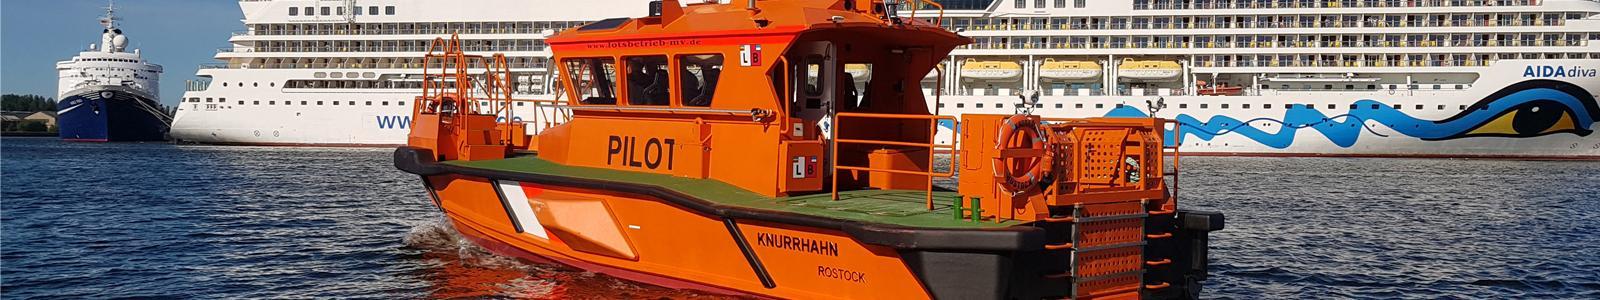 Fender system for workboat Petermann en Knorhahn